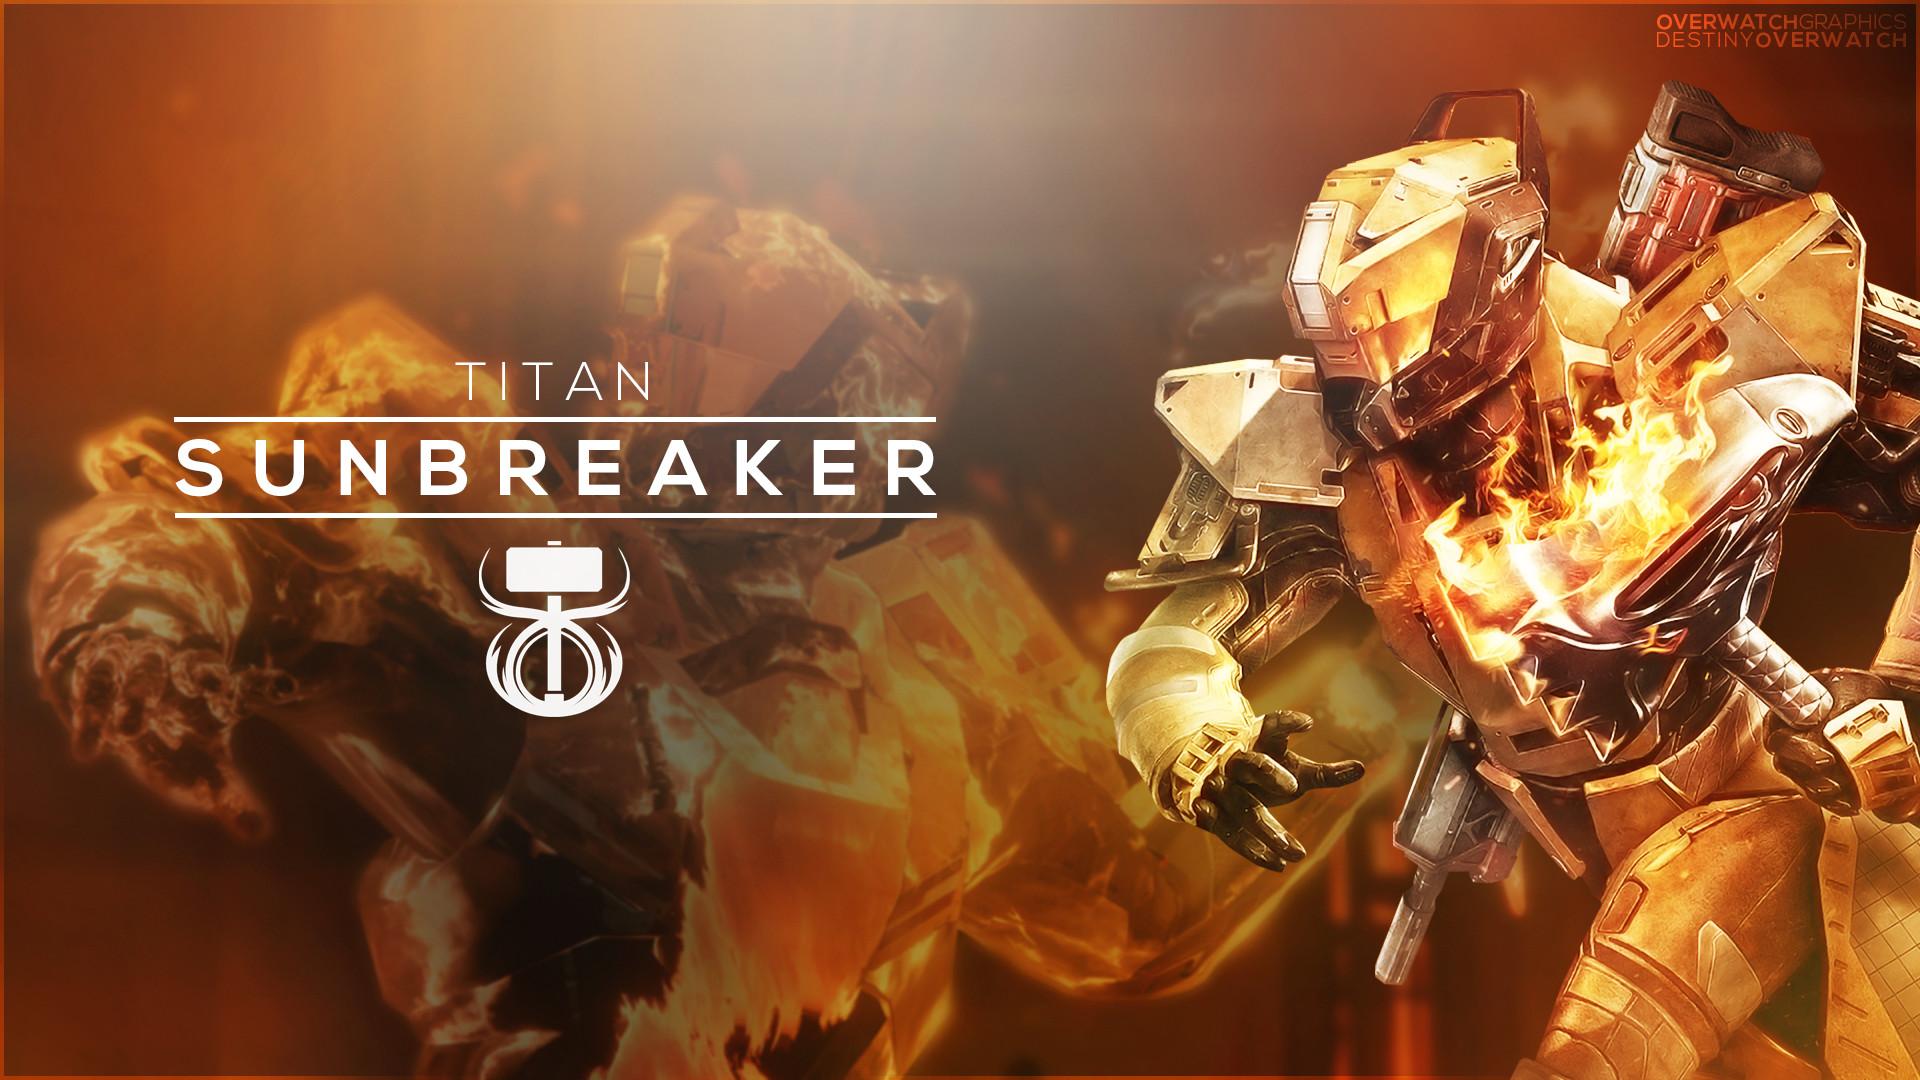 Res: 1920x1080, ... OverwatchGraphics Destiny the Game - Sunbreaker Wallpaper by  OverwatchGraphics